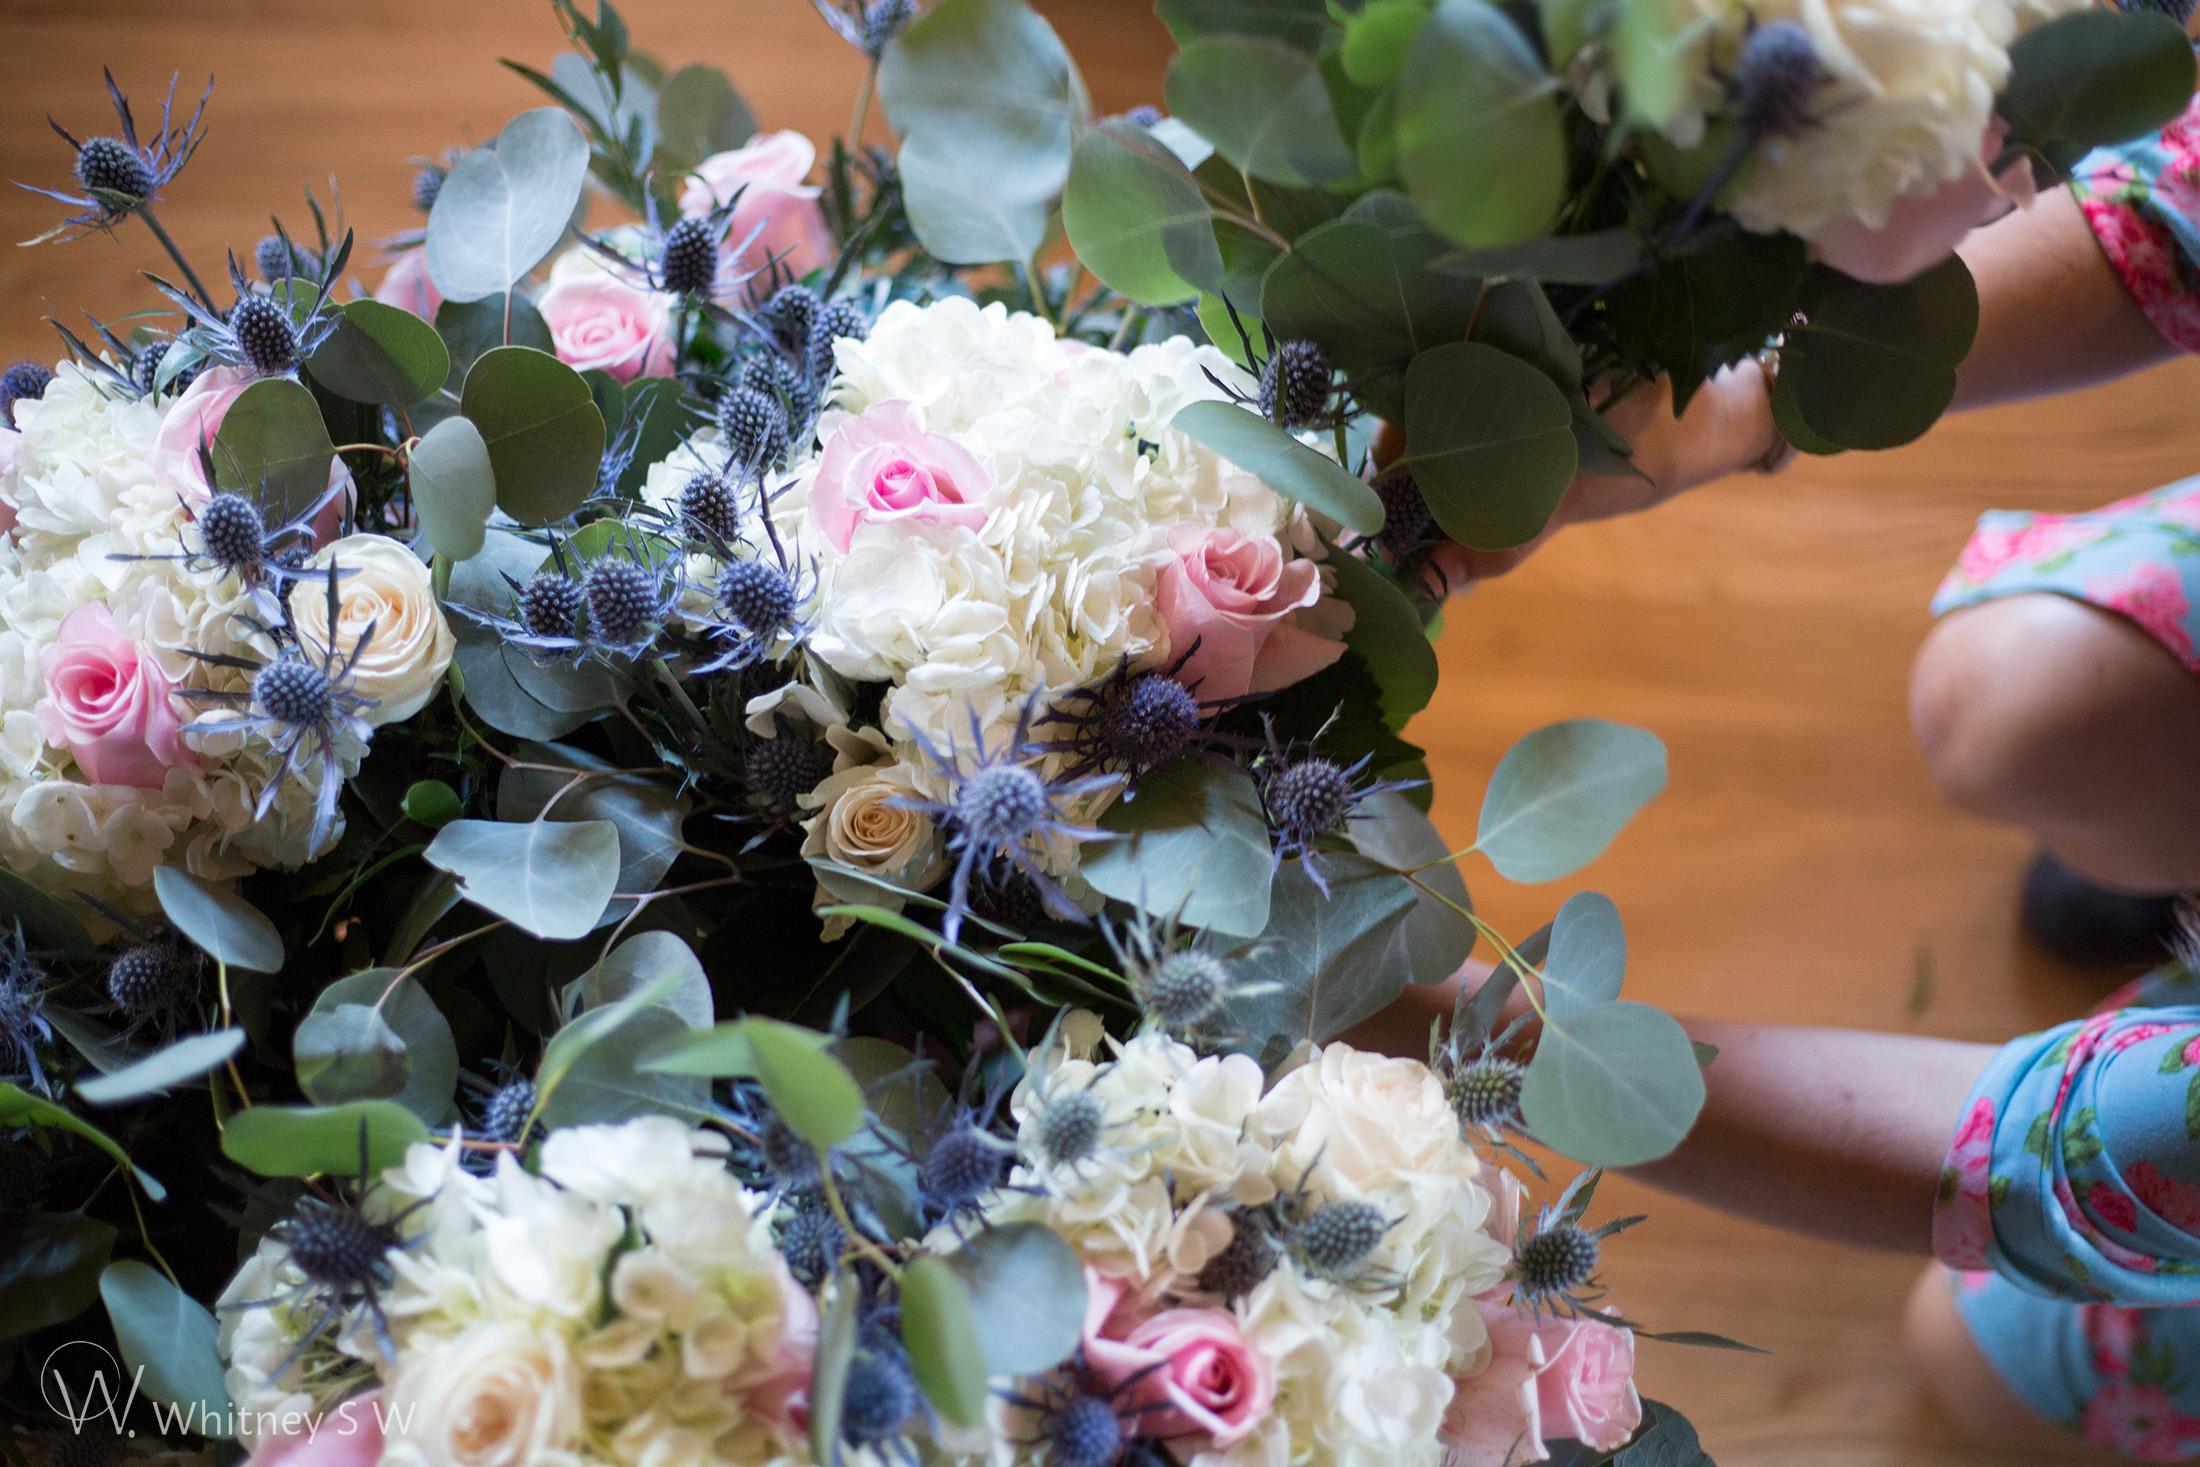 Morgan & Kaivon Wedding - Photography by Whitney S Williams whitneysw (11).jpg